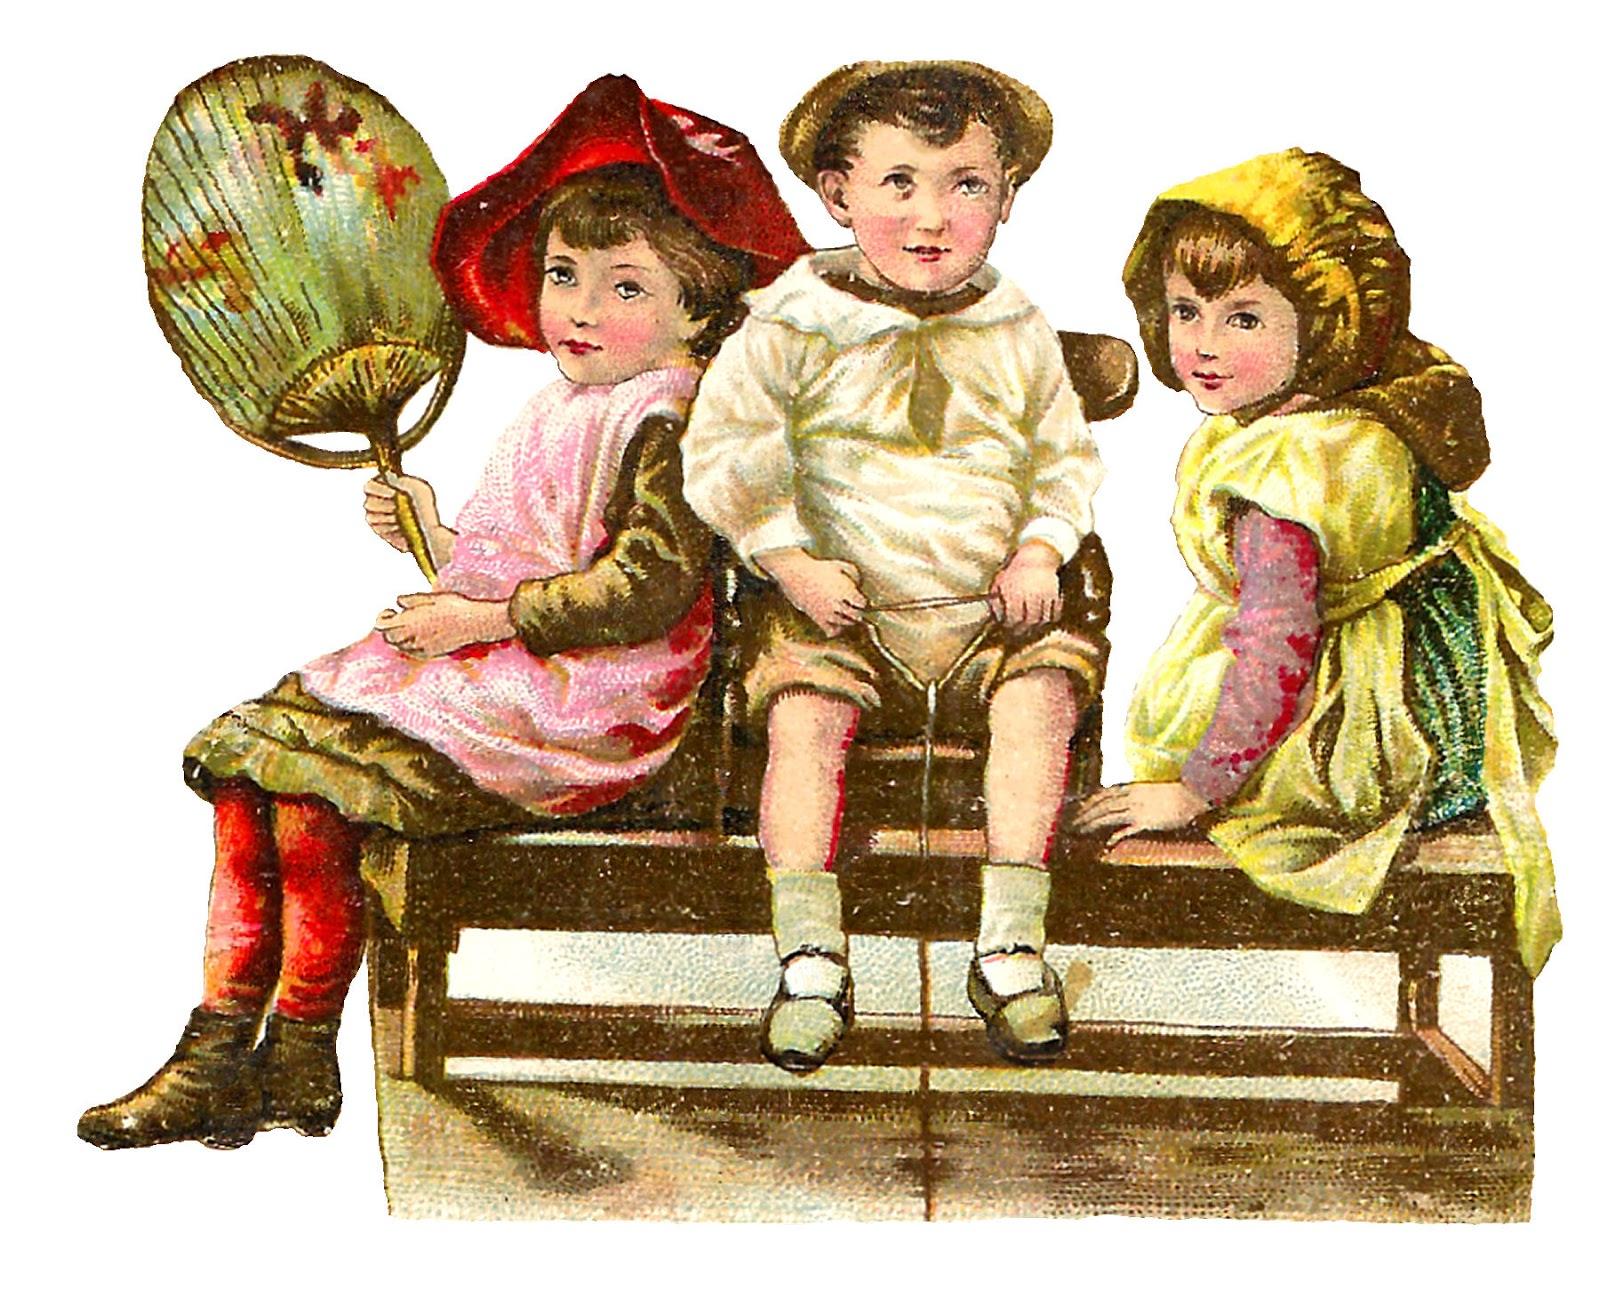 Antique images free victorian. Bench clipart vintage